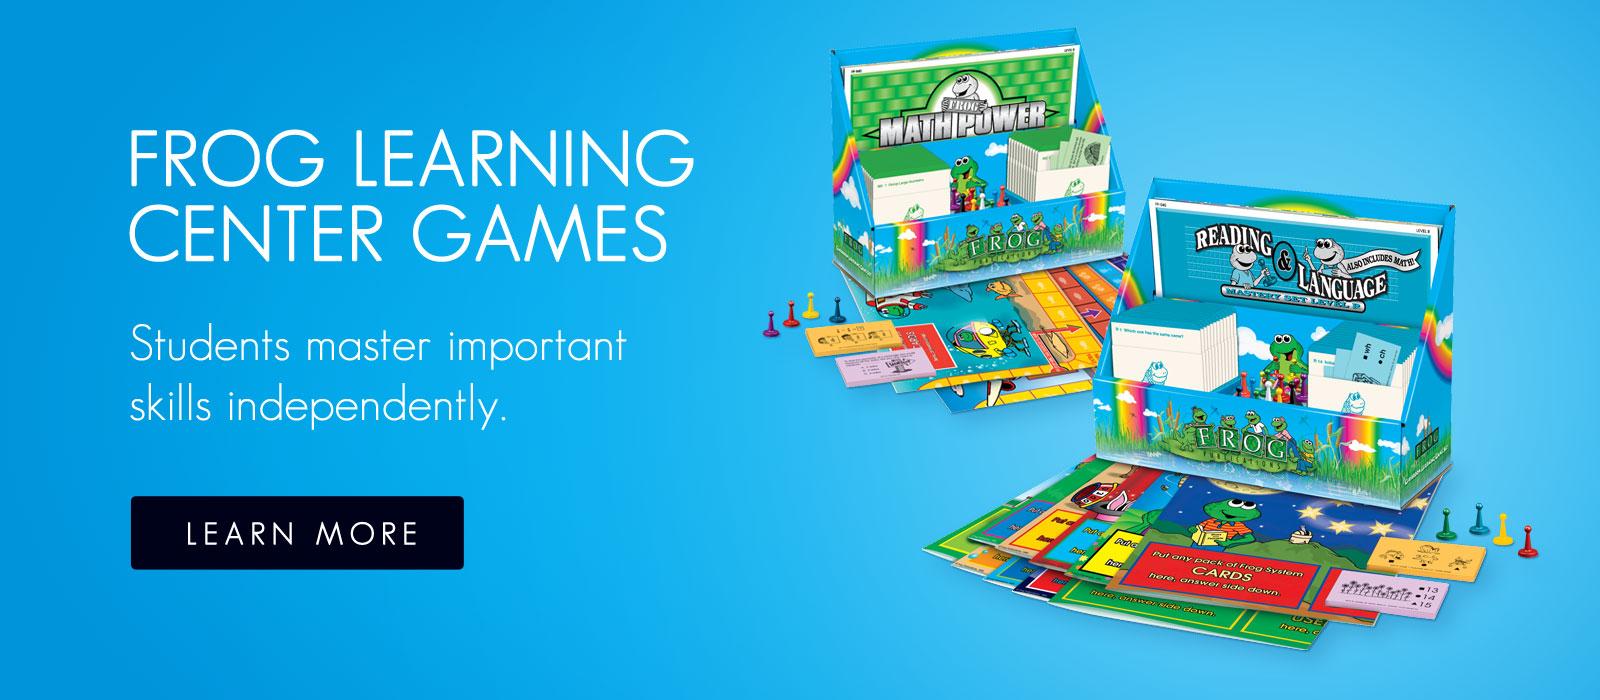 Frog Learning Center Games